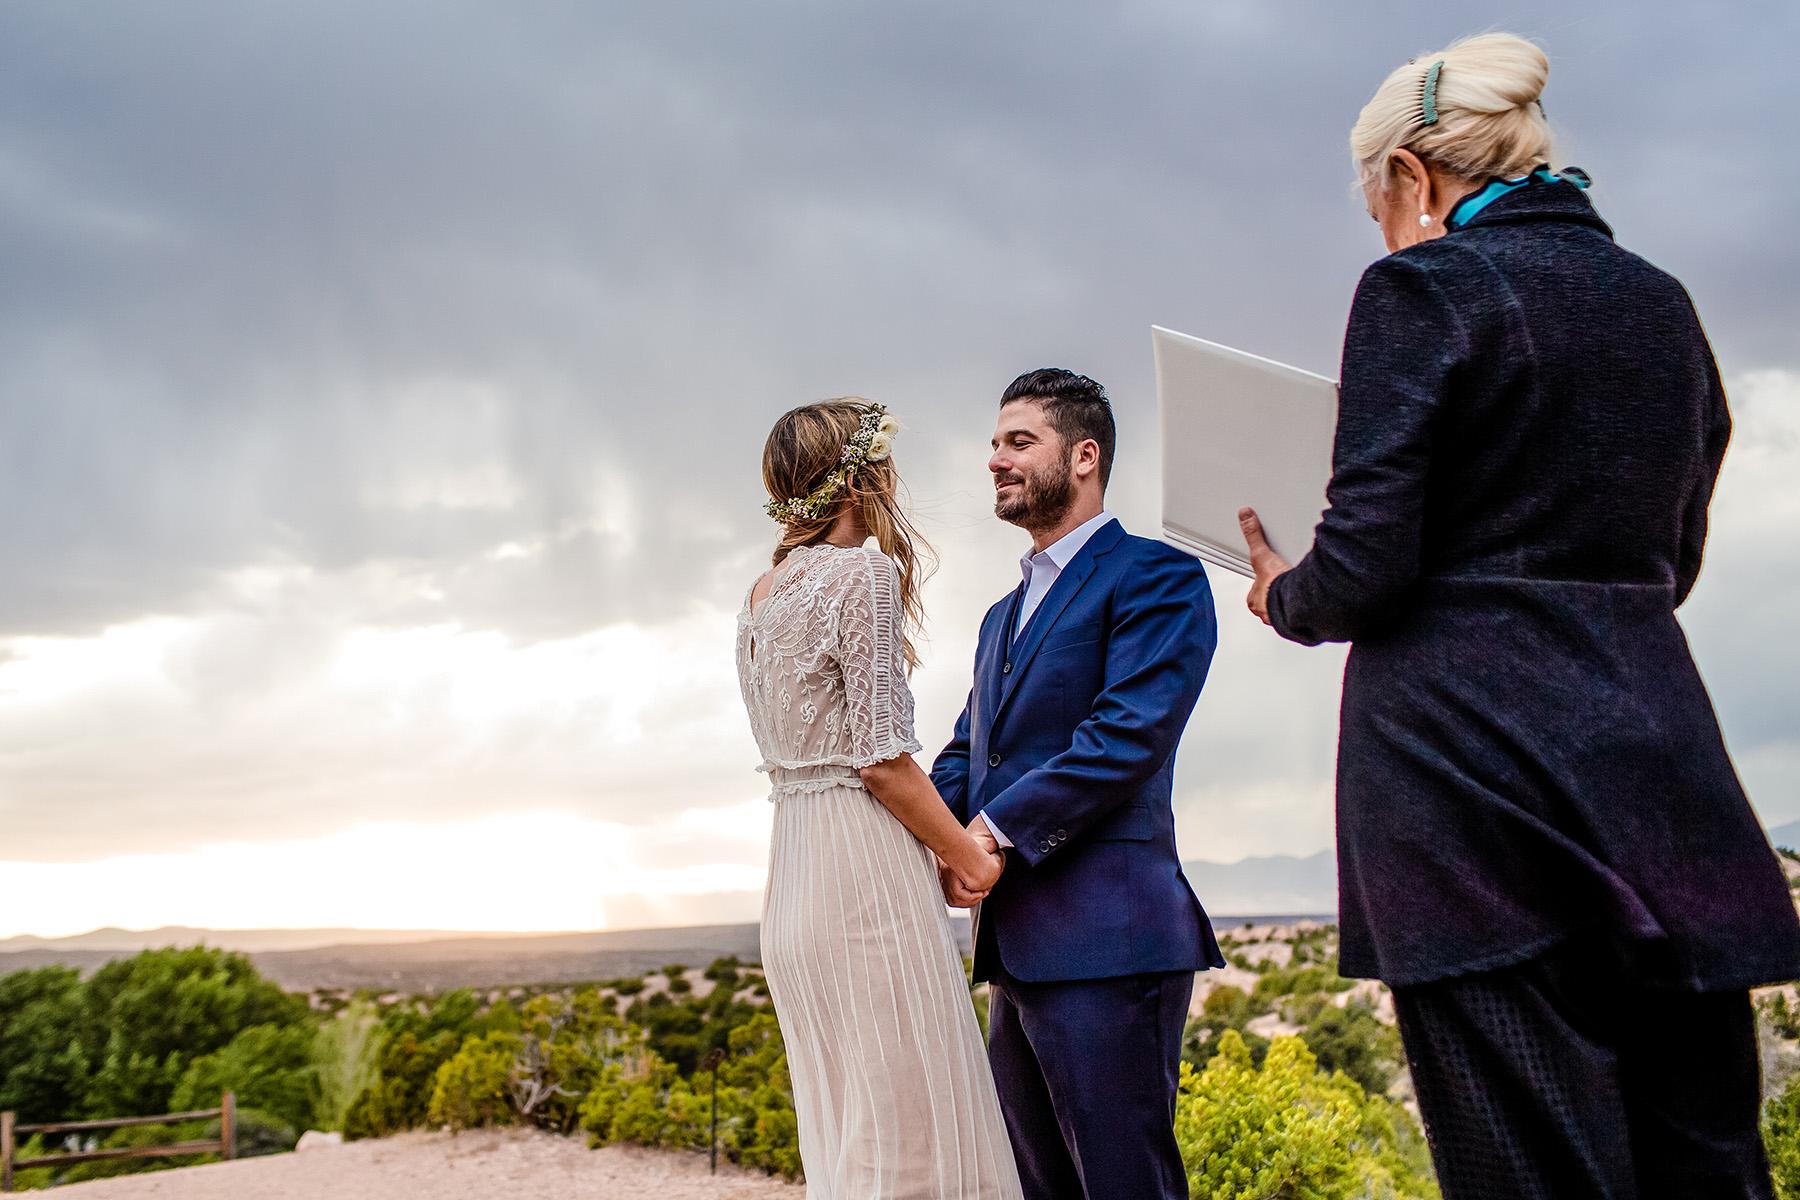 Melinda-Dustin-wedding-four-seasons-resort-santa-fe-new-mexico-1008